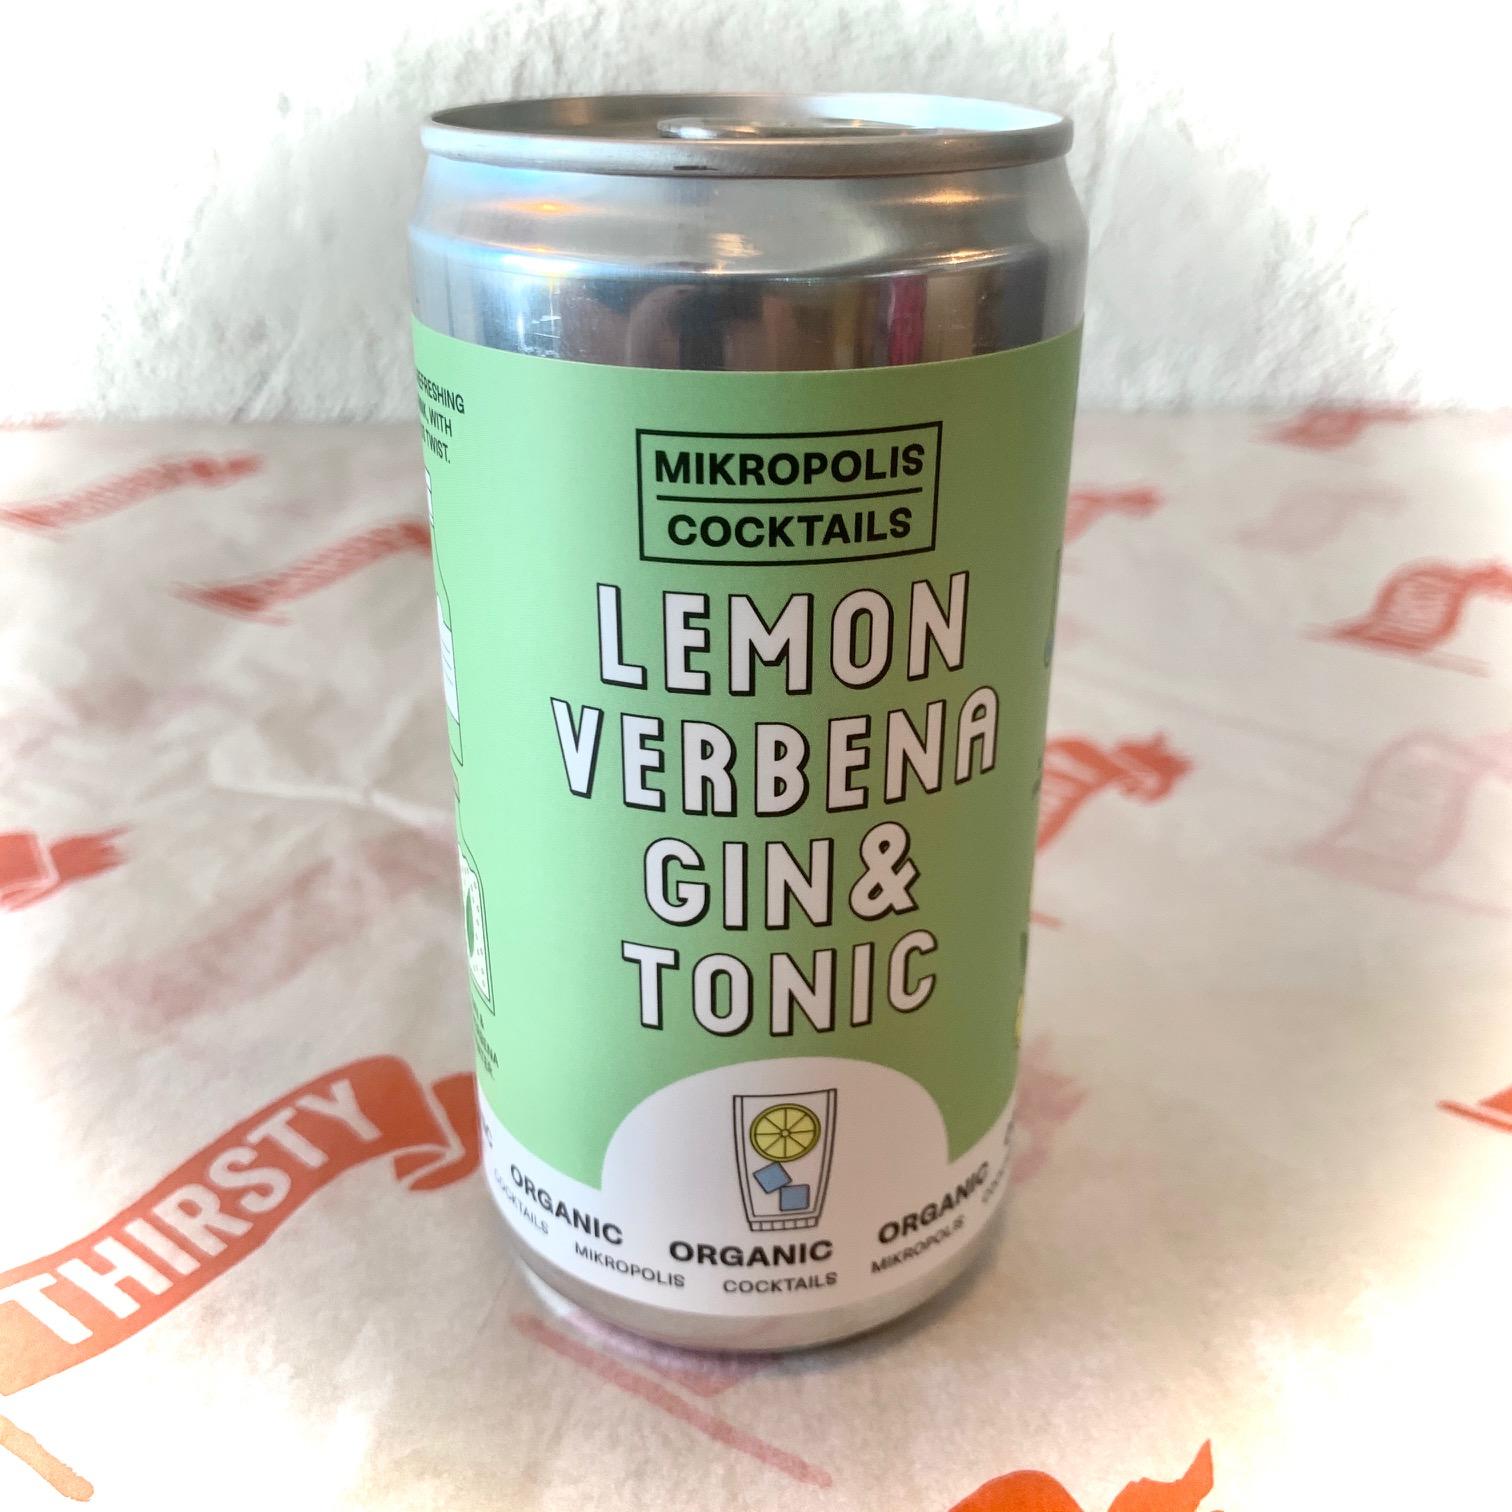 Mikropolis | Lemon Verbena G&T | Organic Canned Cocktail 6.5% 250ml